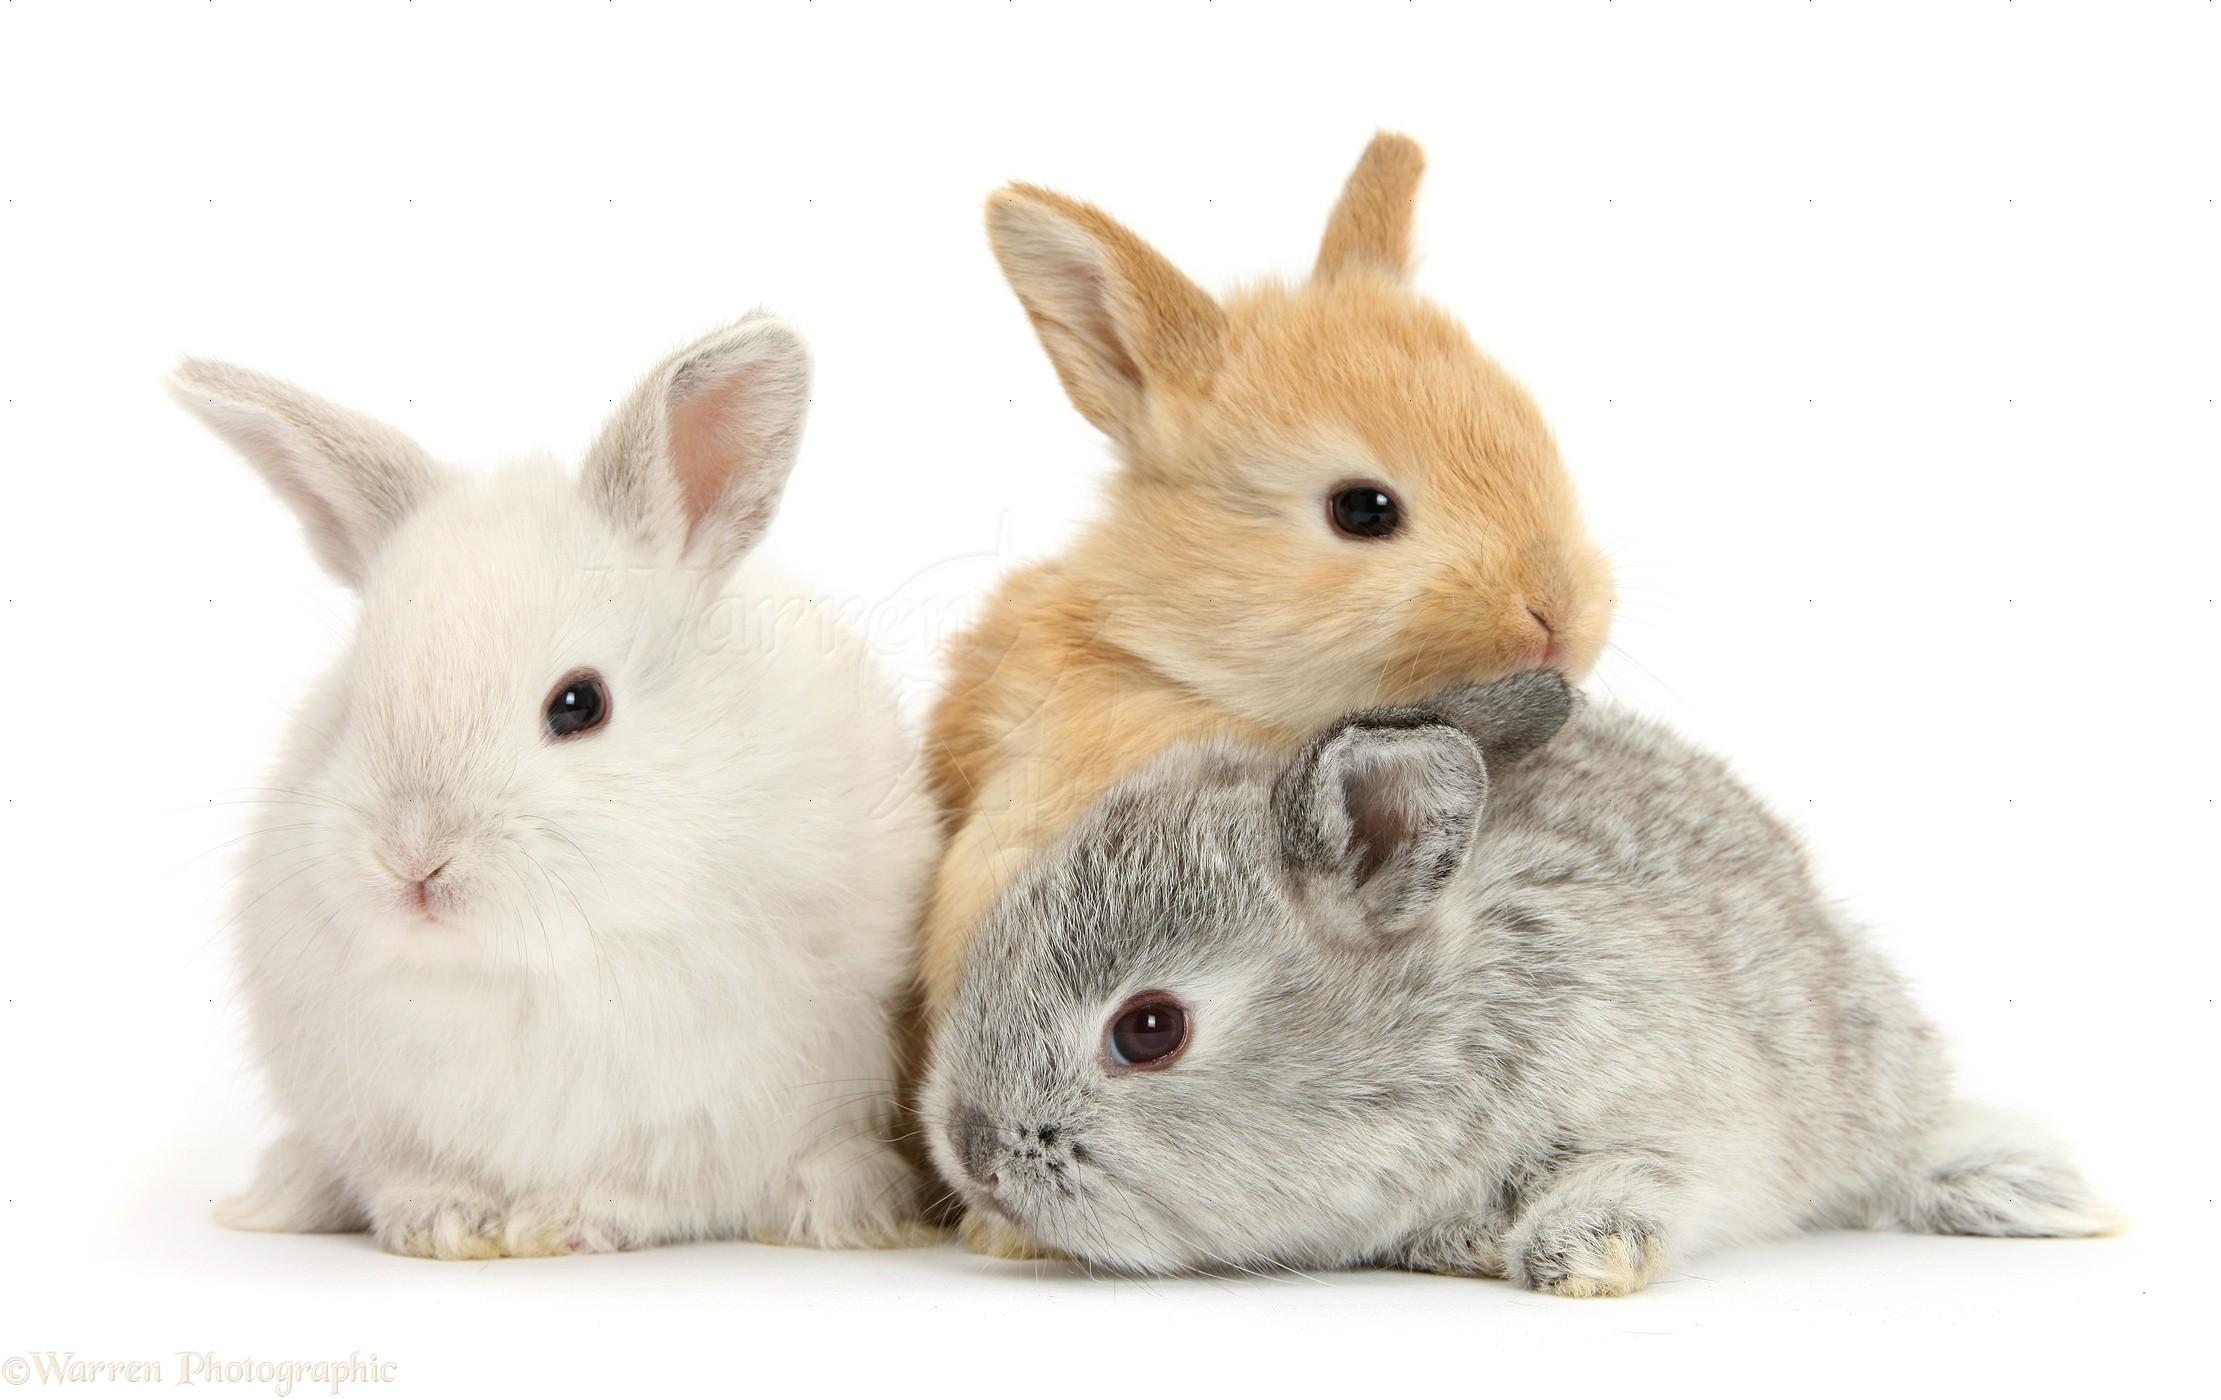 three cute baby lop rabbits photo wp27532